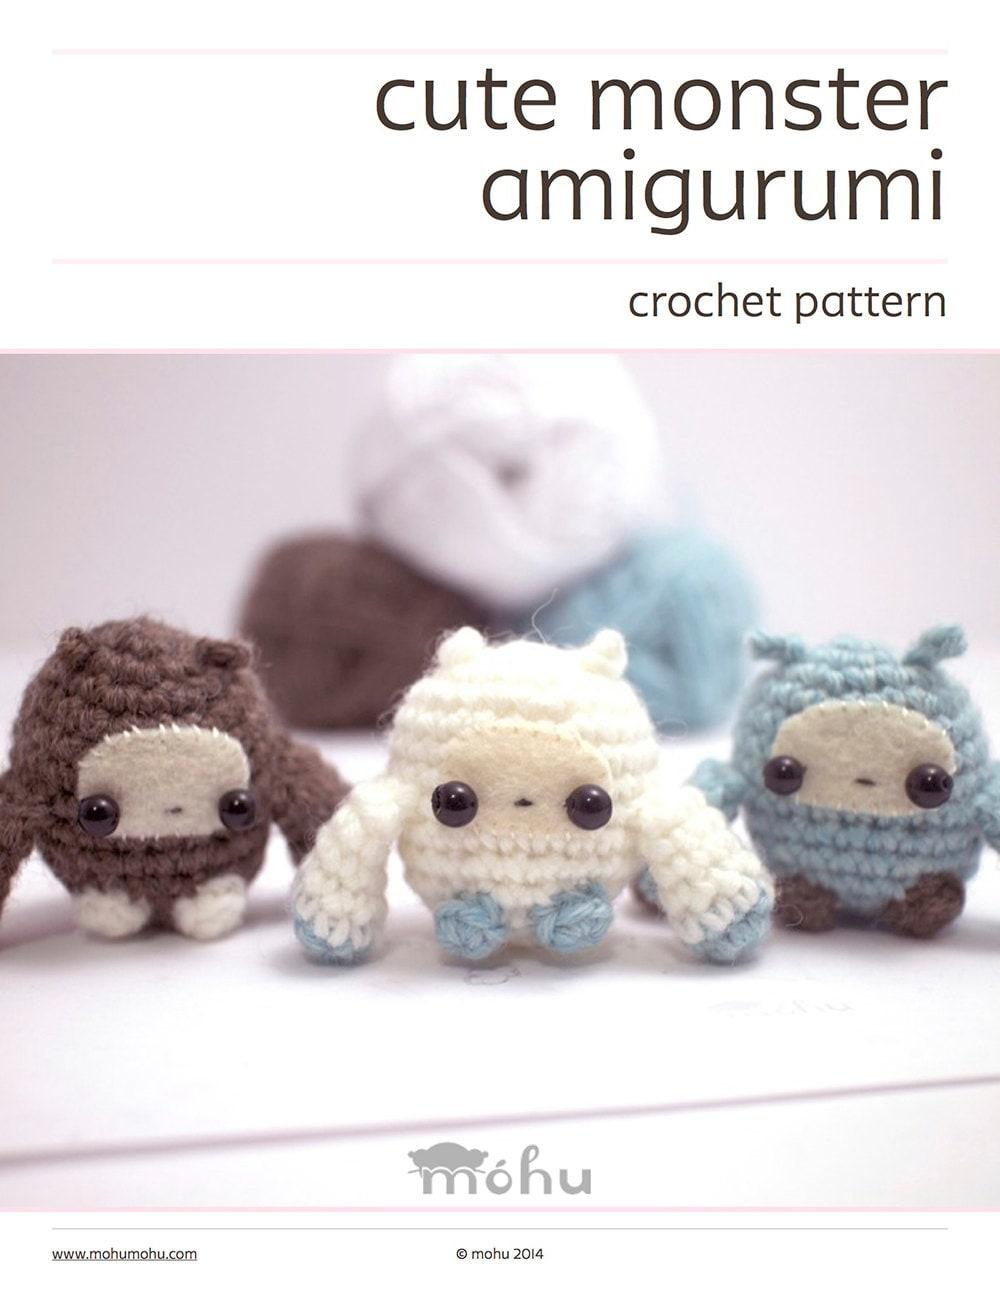 Free Crochet Monster Patterns | Crochet monsters, Crochet animals ... | 1307x1000